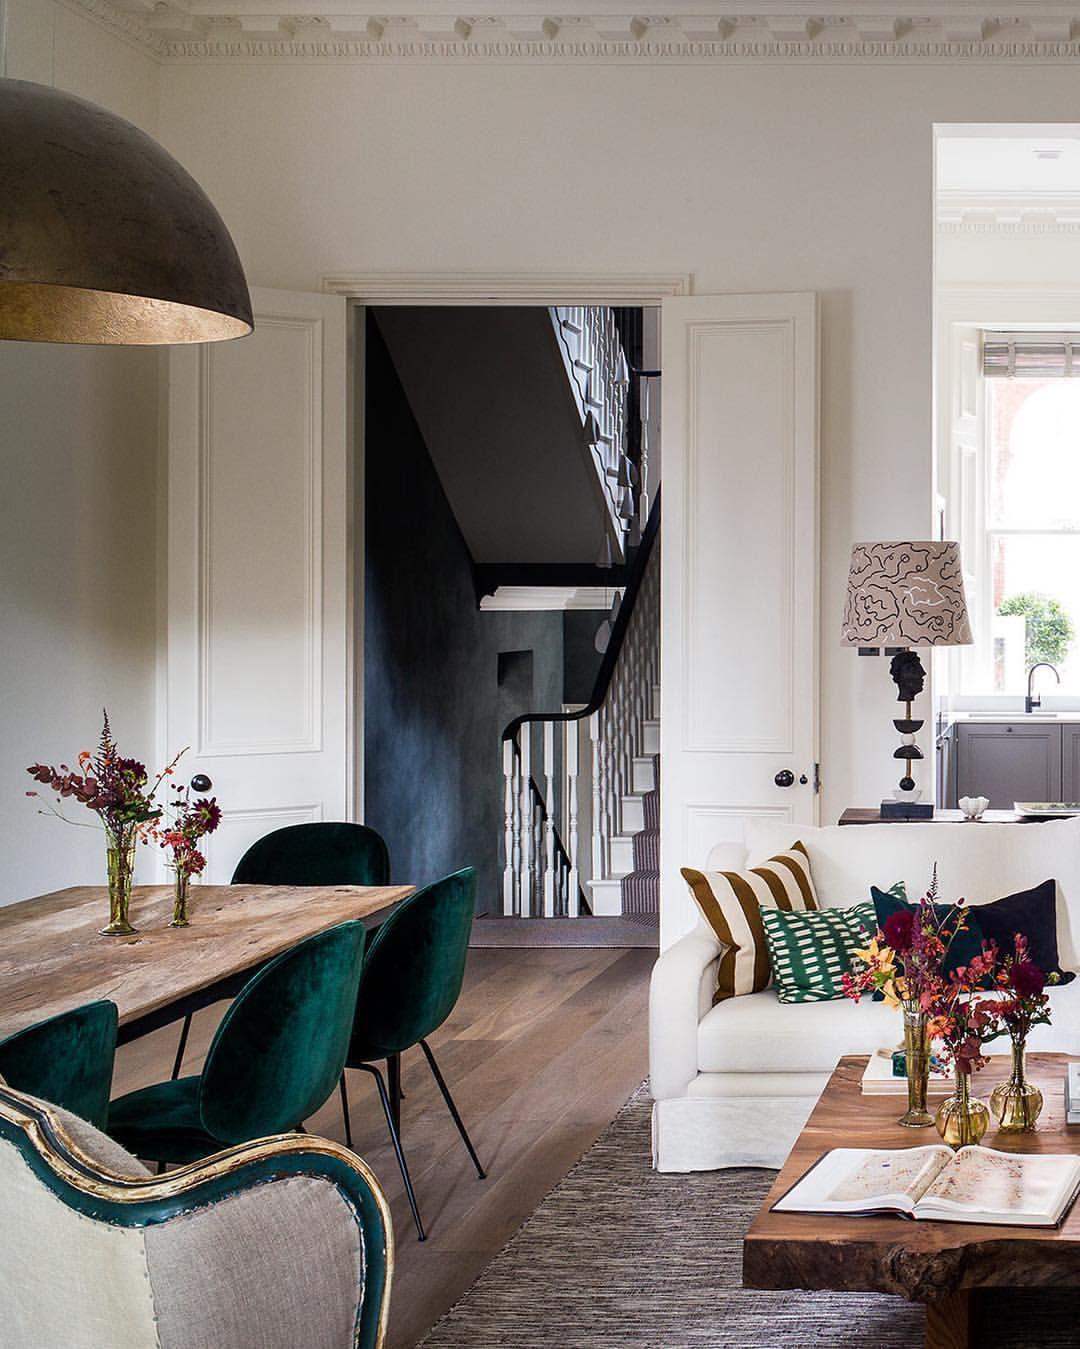 Teal Dining Room: Designed By Sophie Elborne Of Kitesgrove